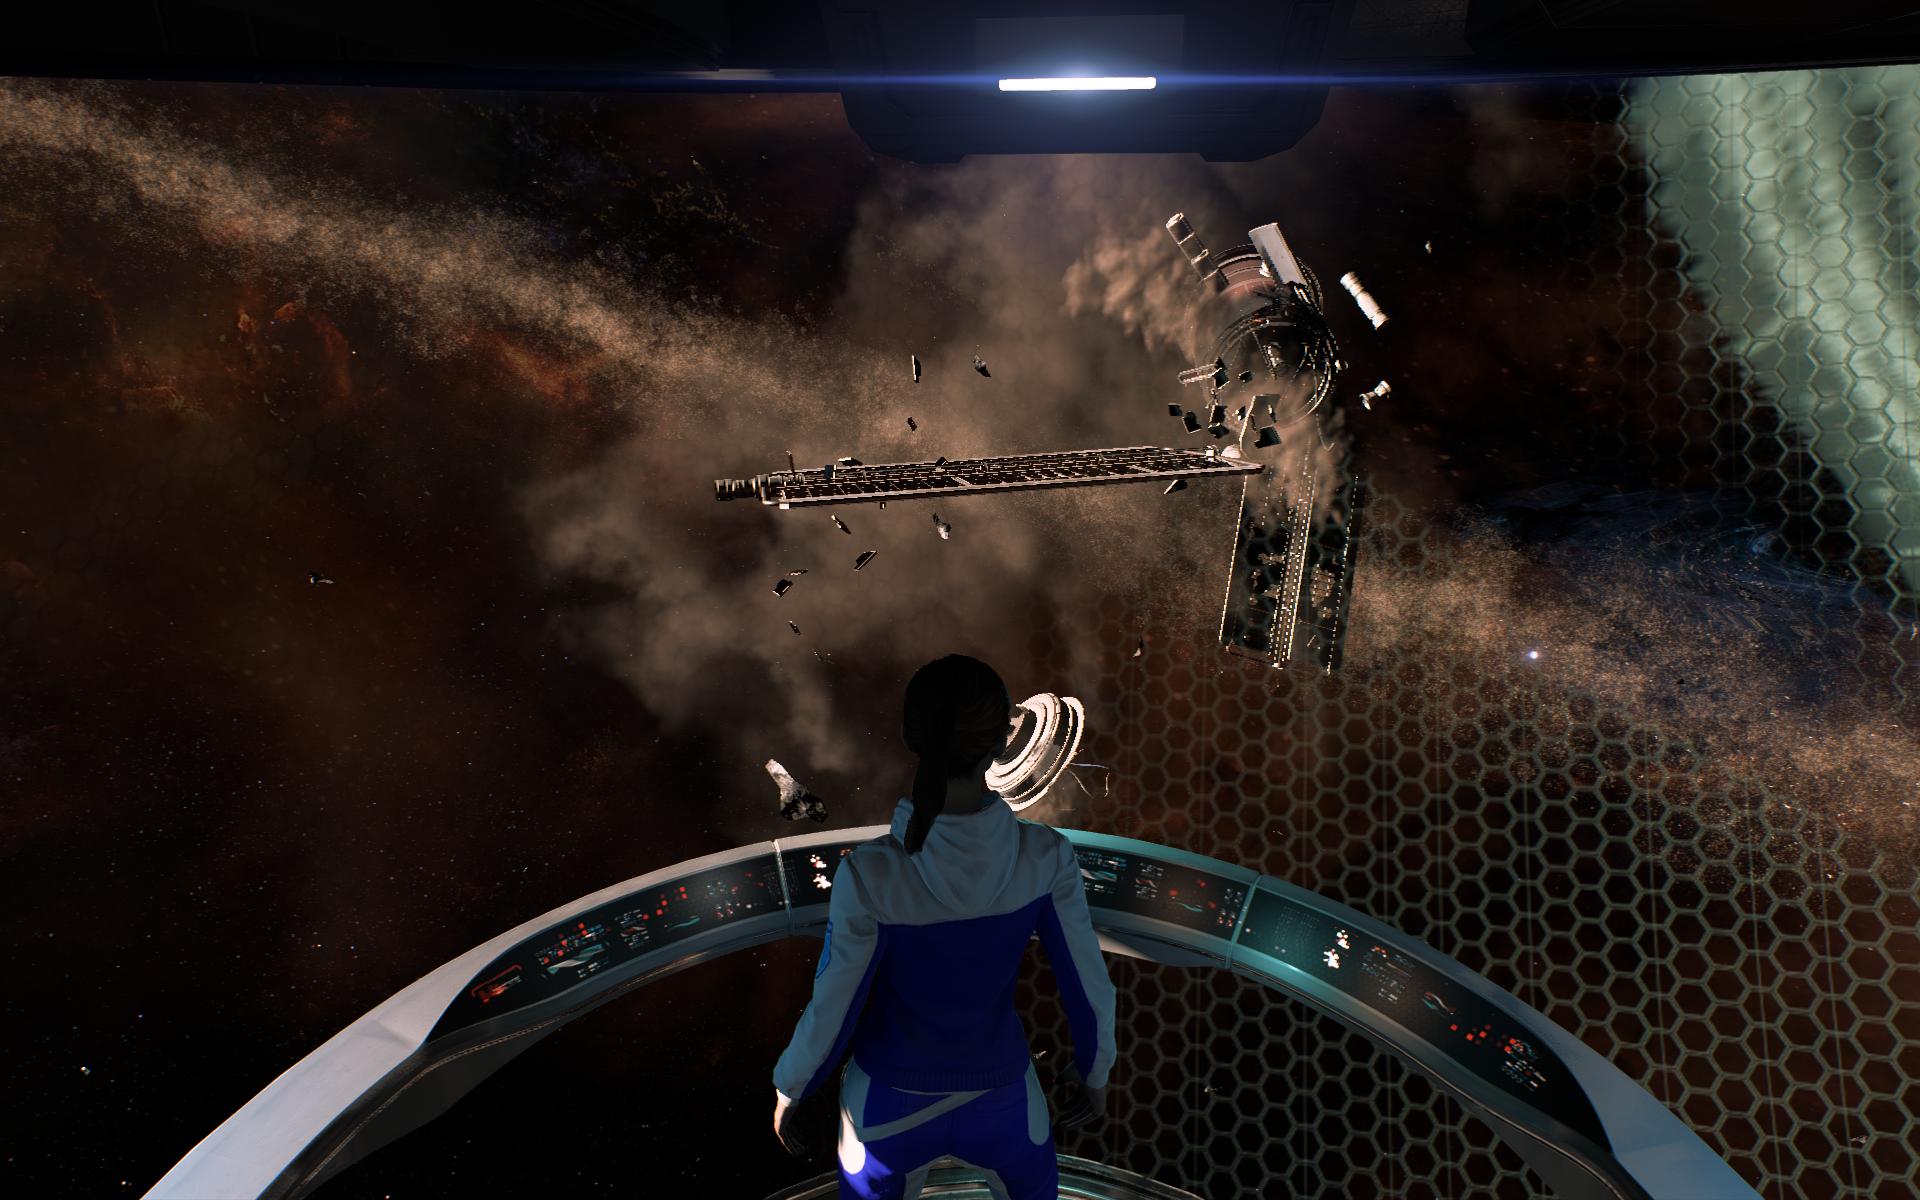 Mass Effect Andromeda Screenshot  - 16.10.25.21.png - Mass Effect: Andromeda